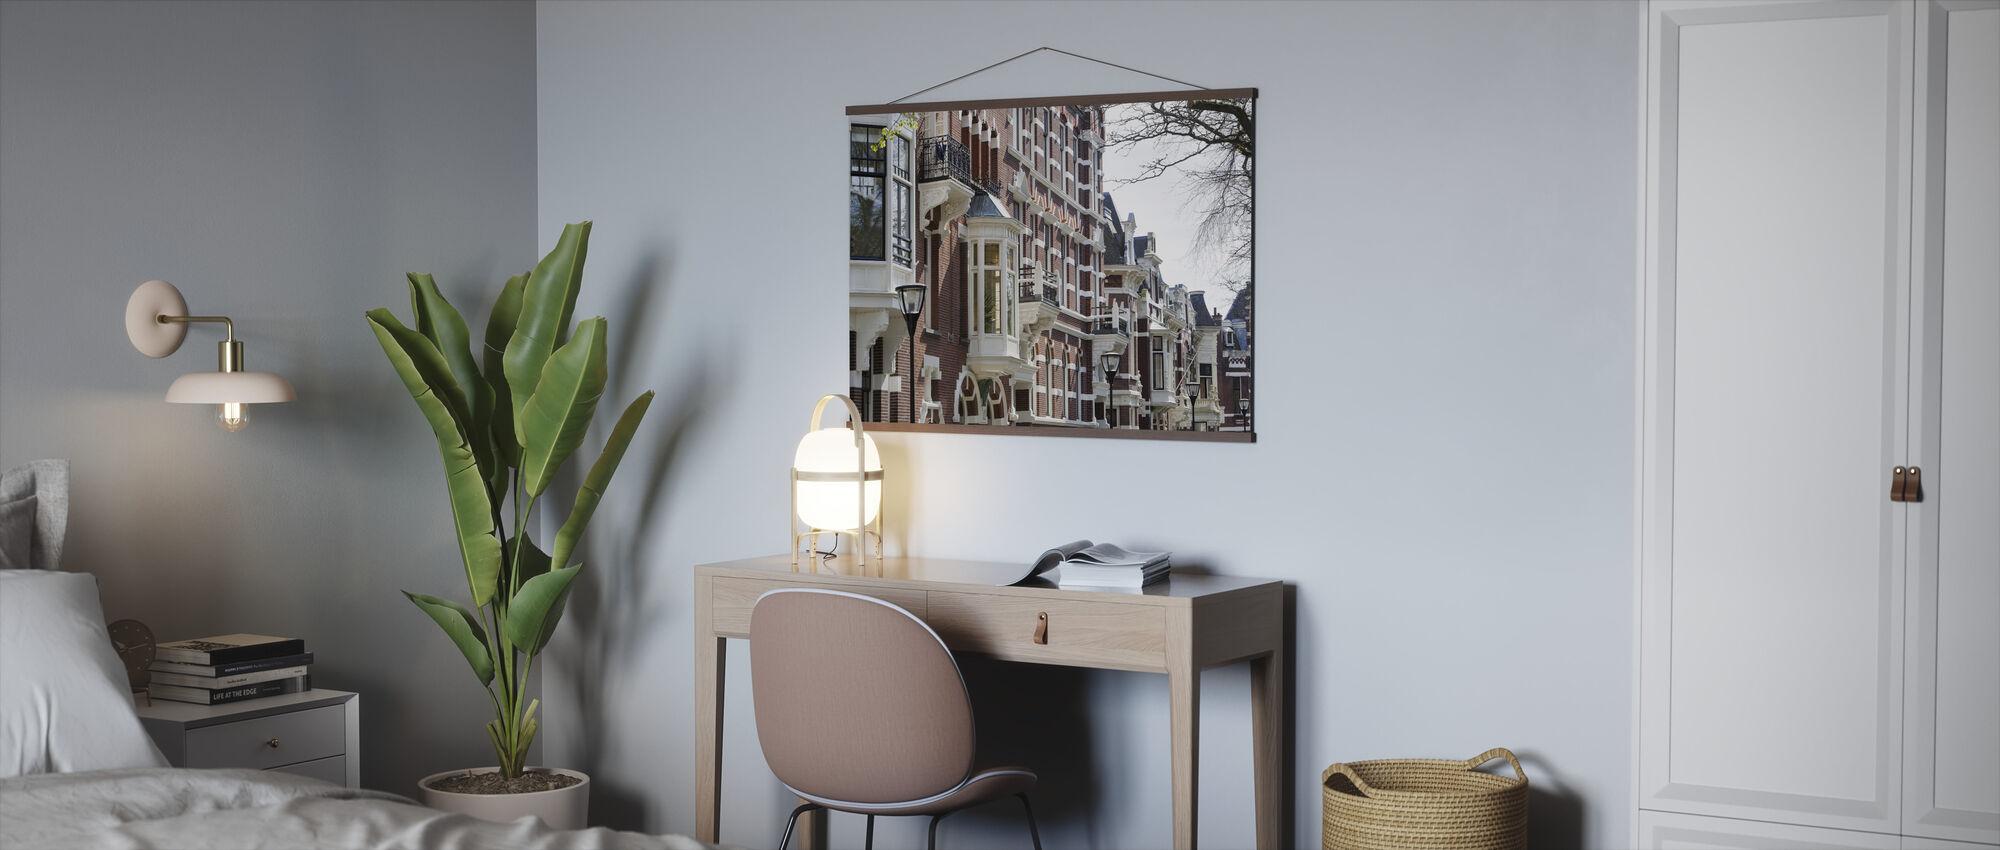 Kralingen in Rotterdam - Poster - Office